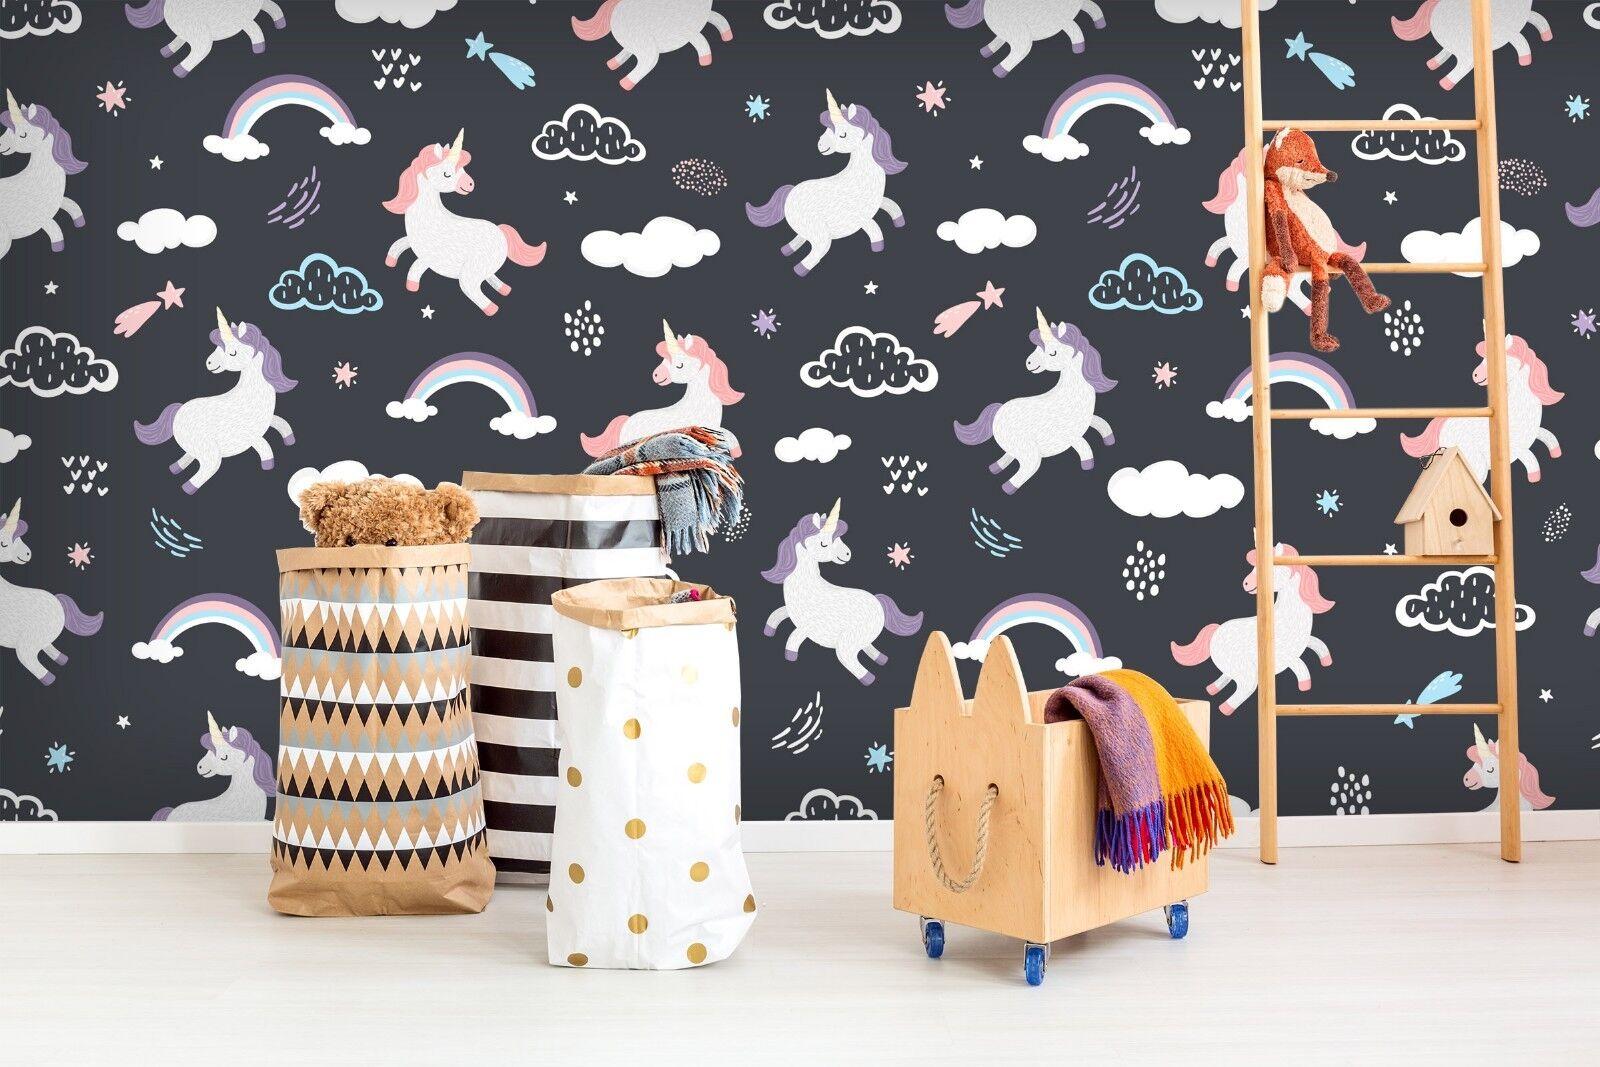 3D Clouds Unicorn 932 Wallpaper Mural Paper Wall Print Indoor Murals CA Summer